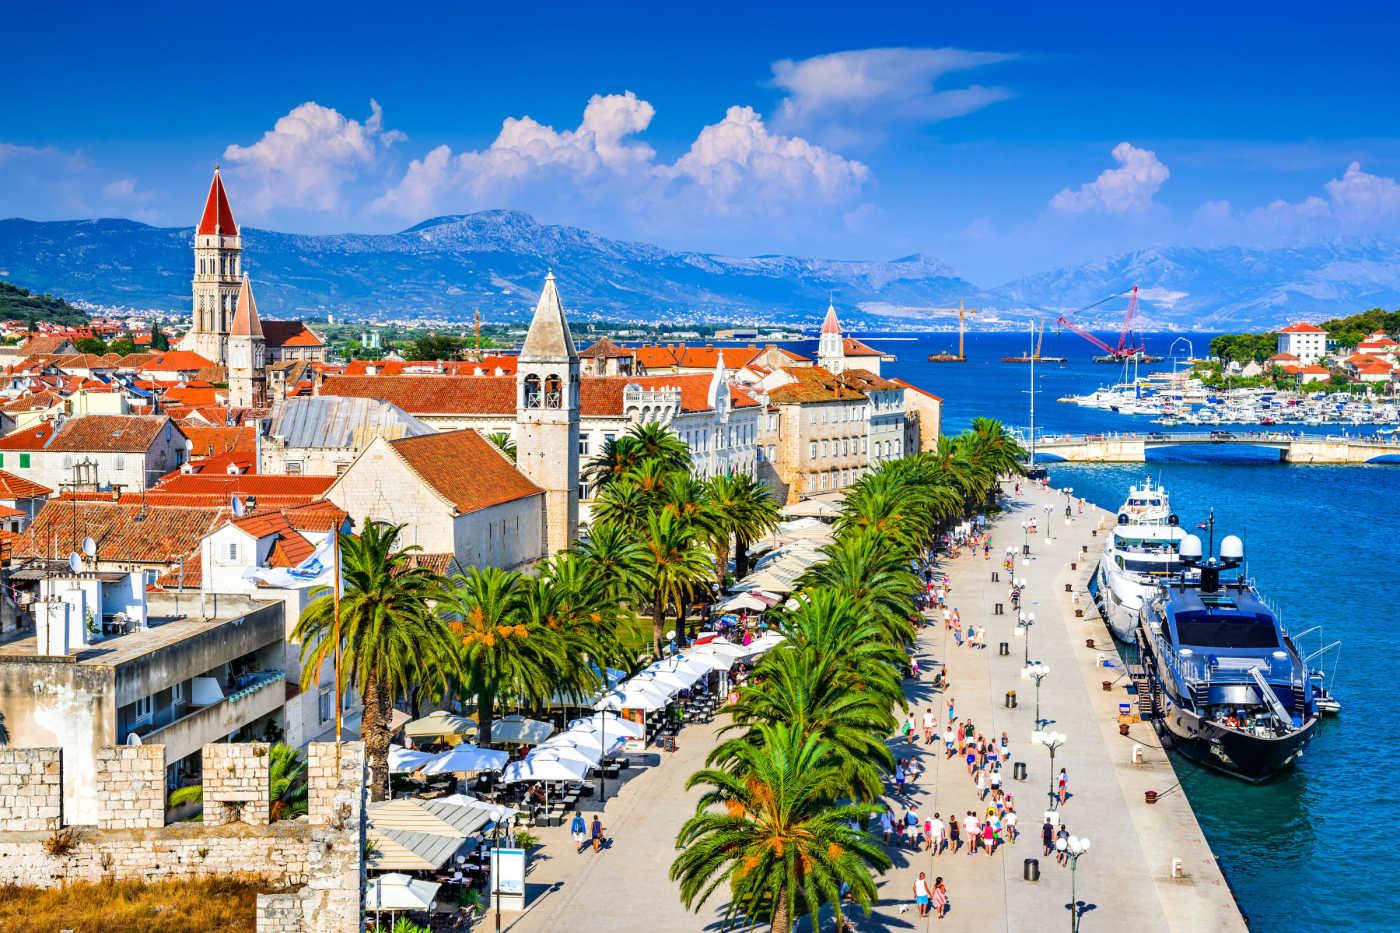 Cruise Vacation Package To Croatia Croatia Adriatic Cruise Cruise Vacation To Croatia Greatvaluevacations Com